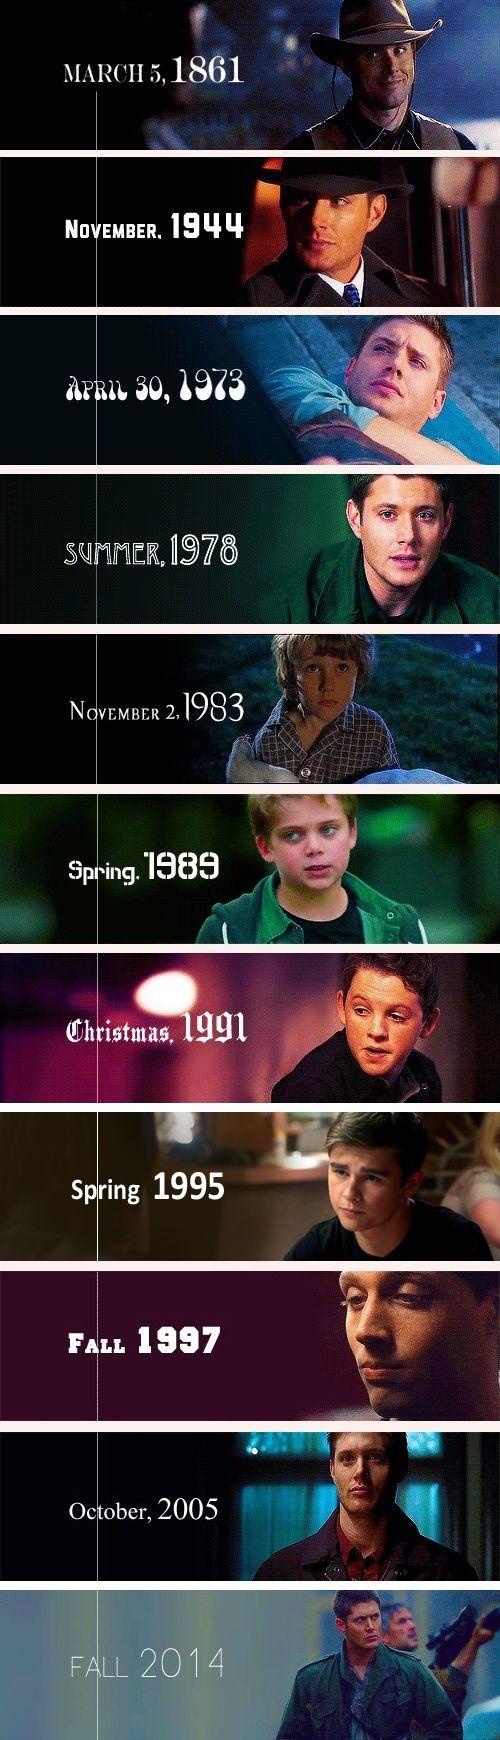 Dean Winchester timeline.